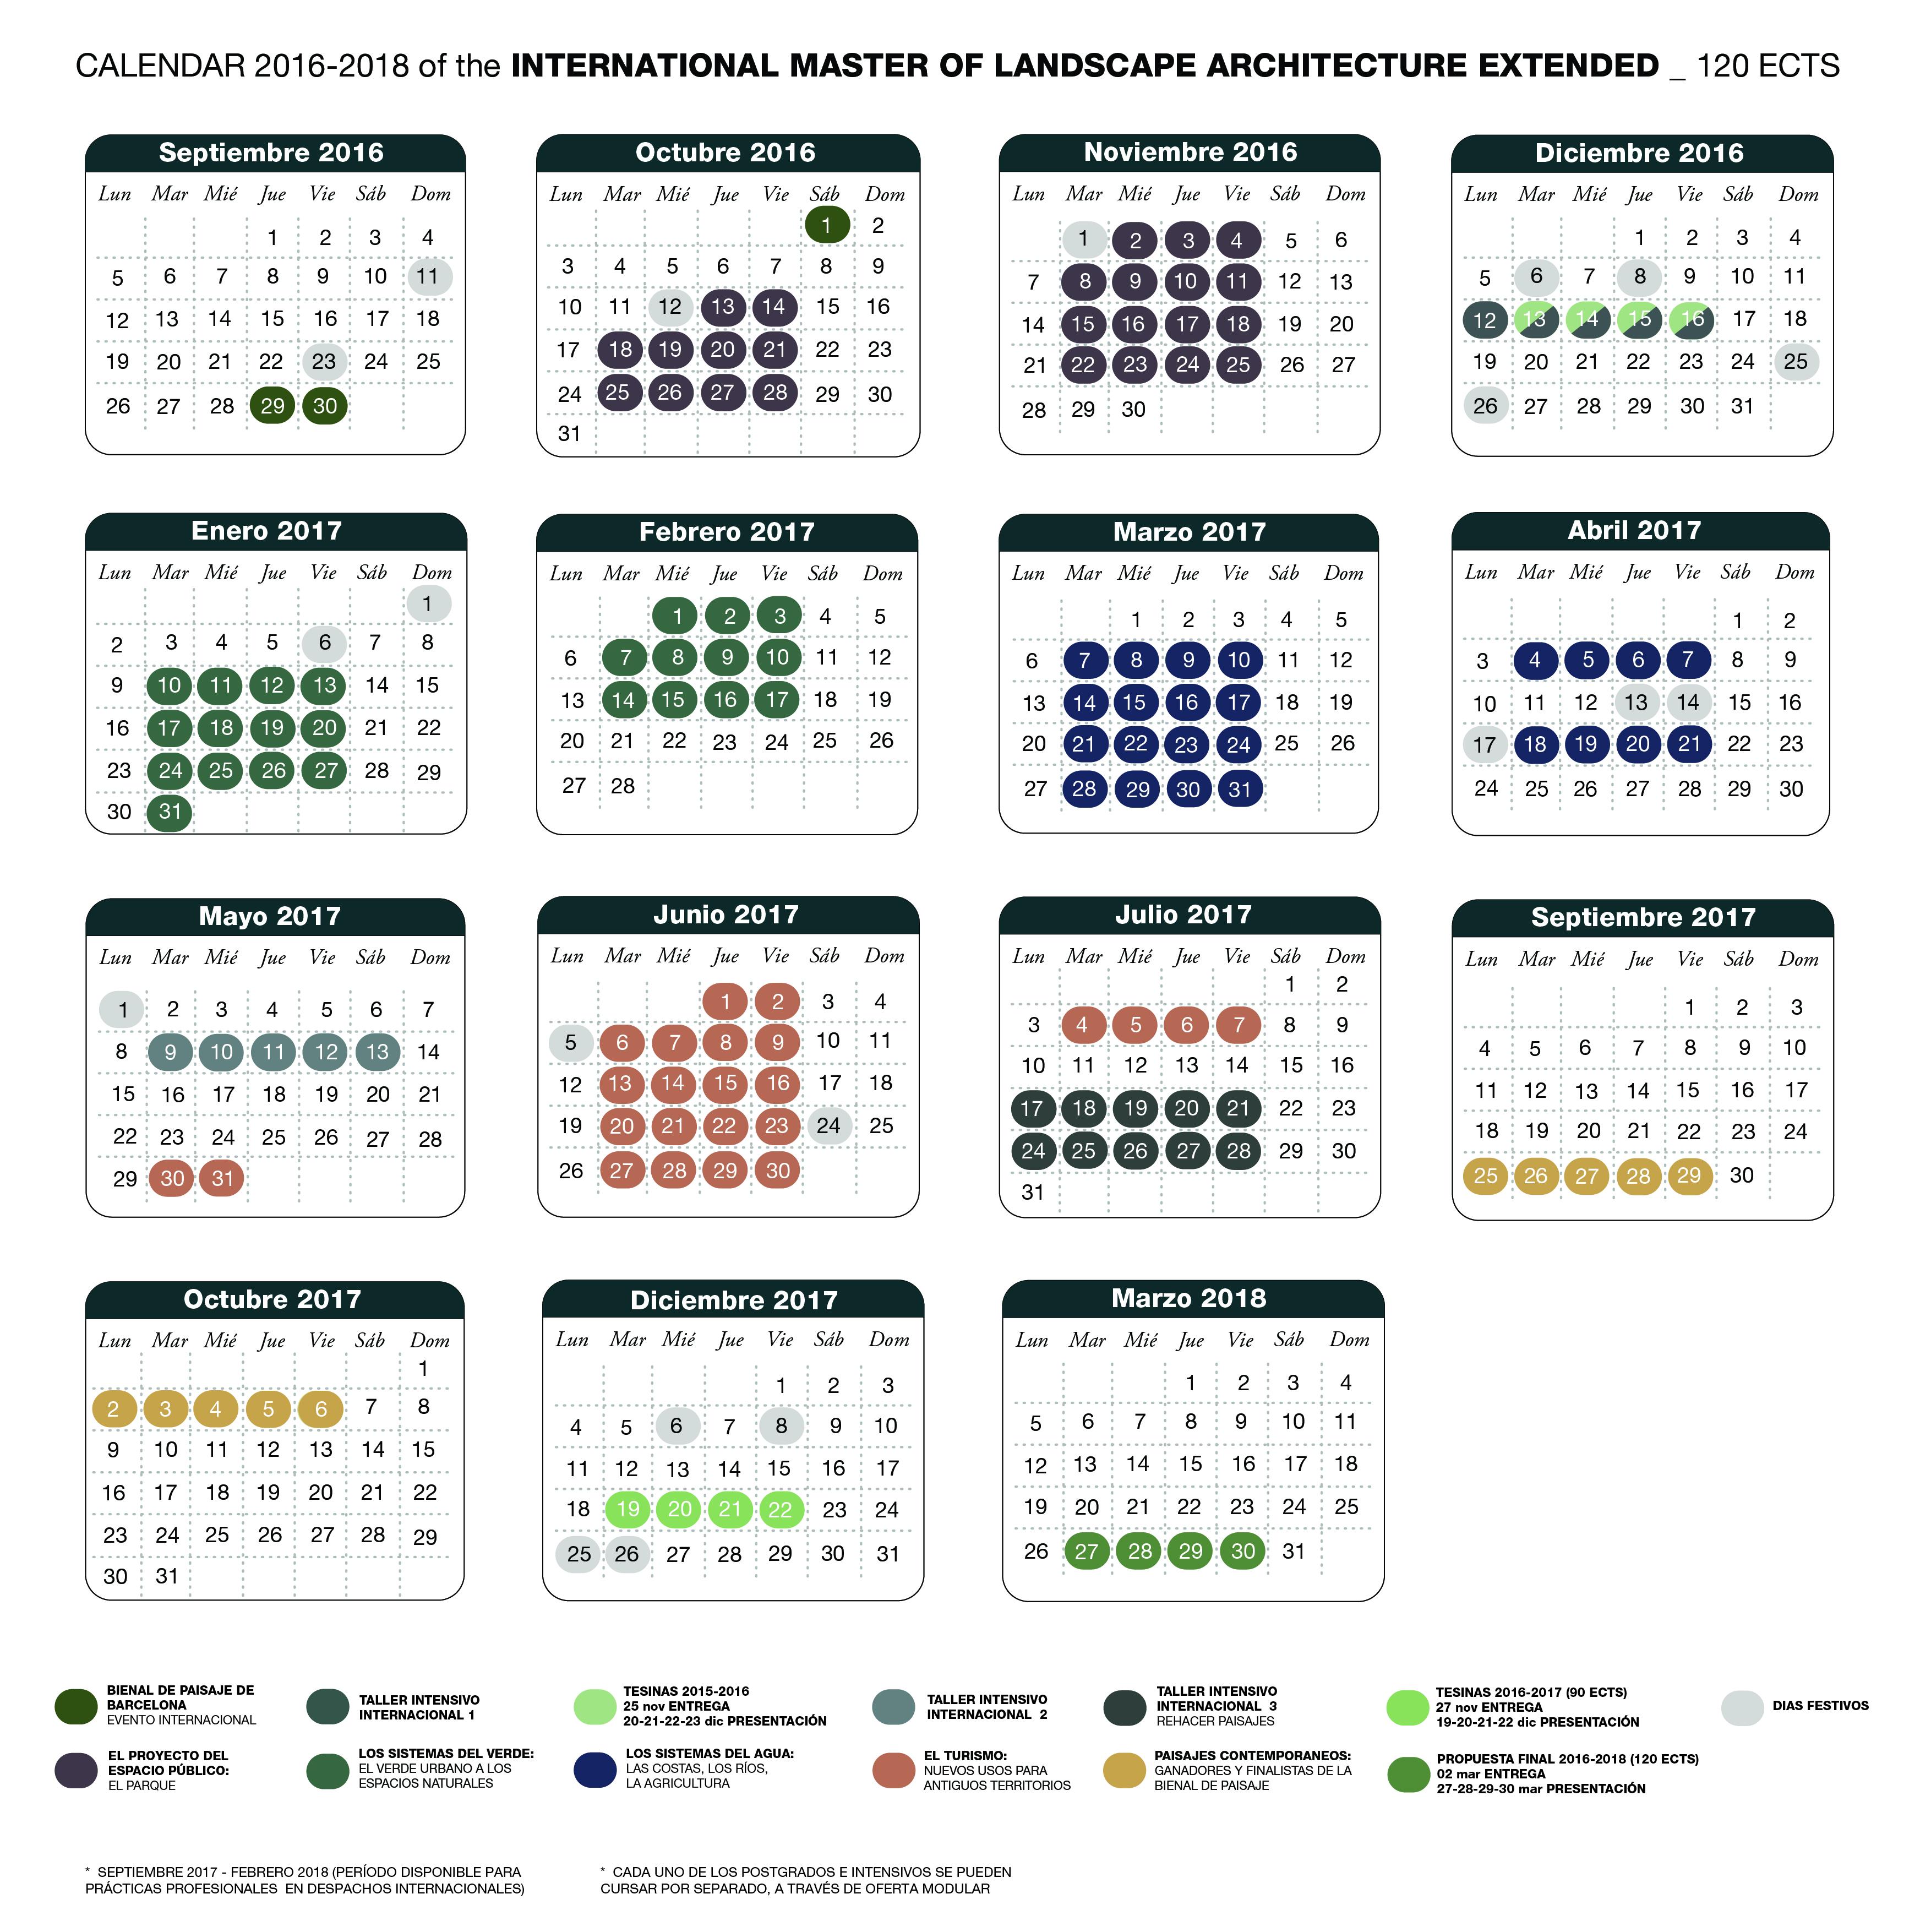 calendari map general 2016-2018 120 ECTS